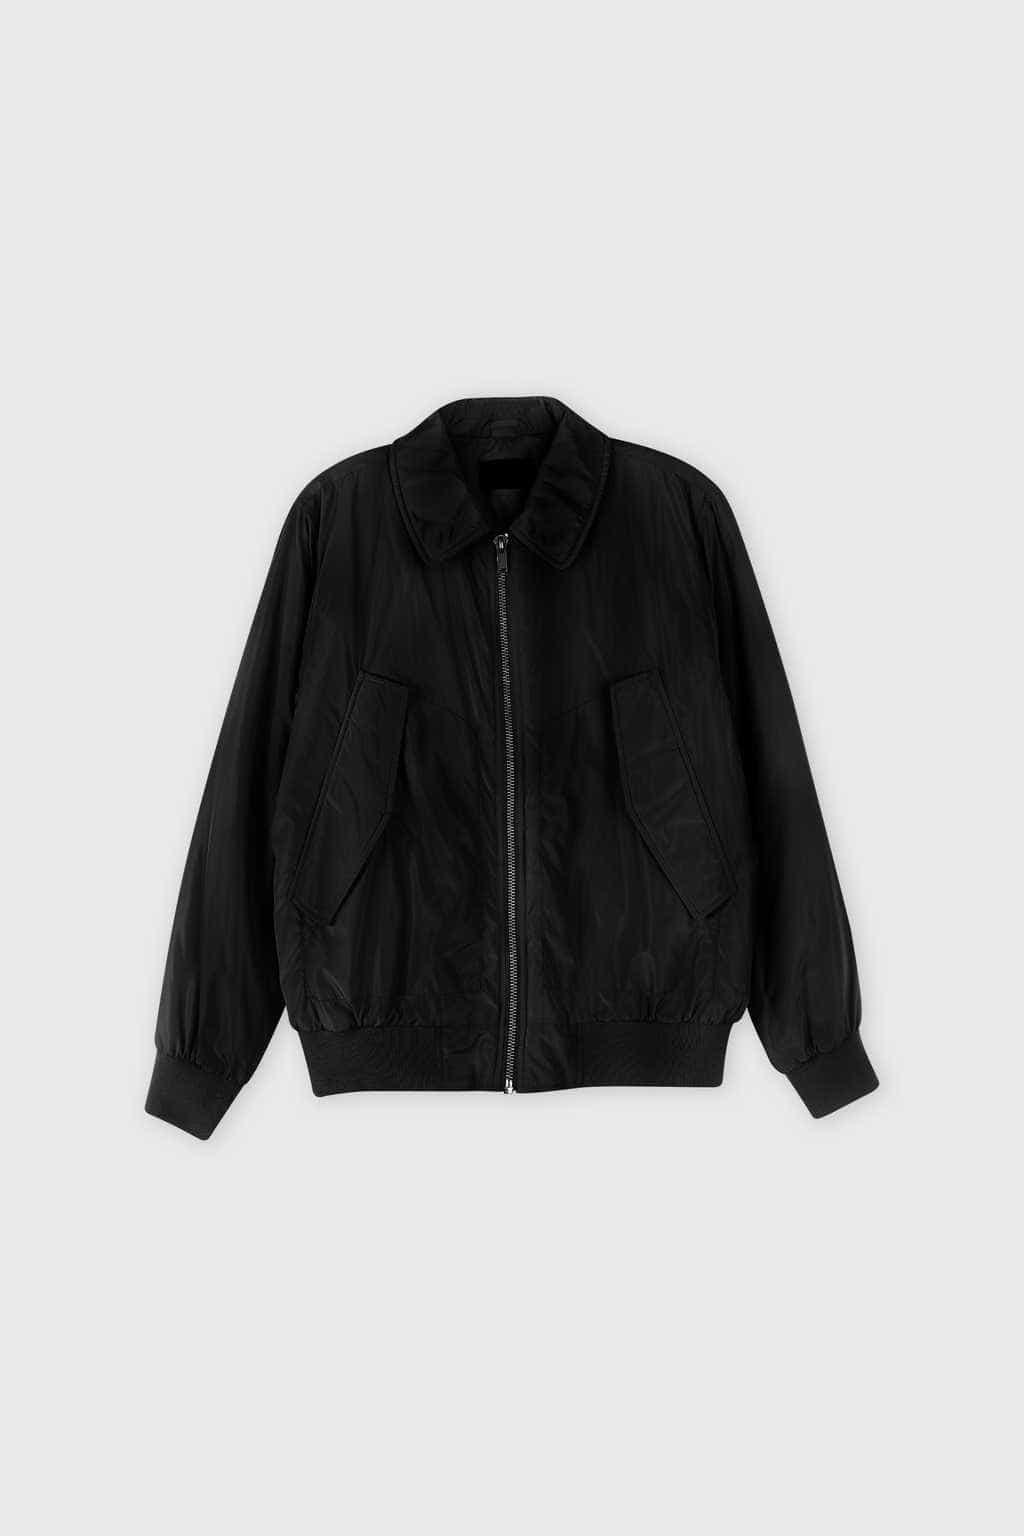 Jacket 2657 Black 15